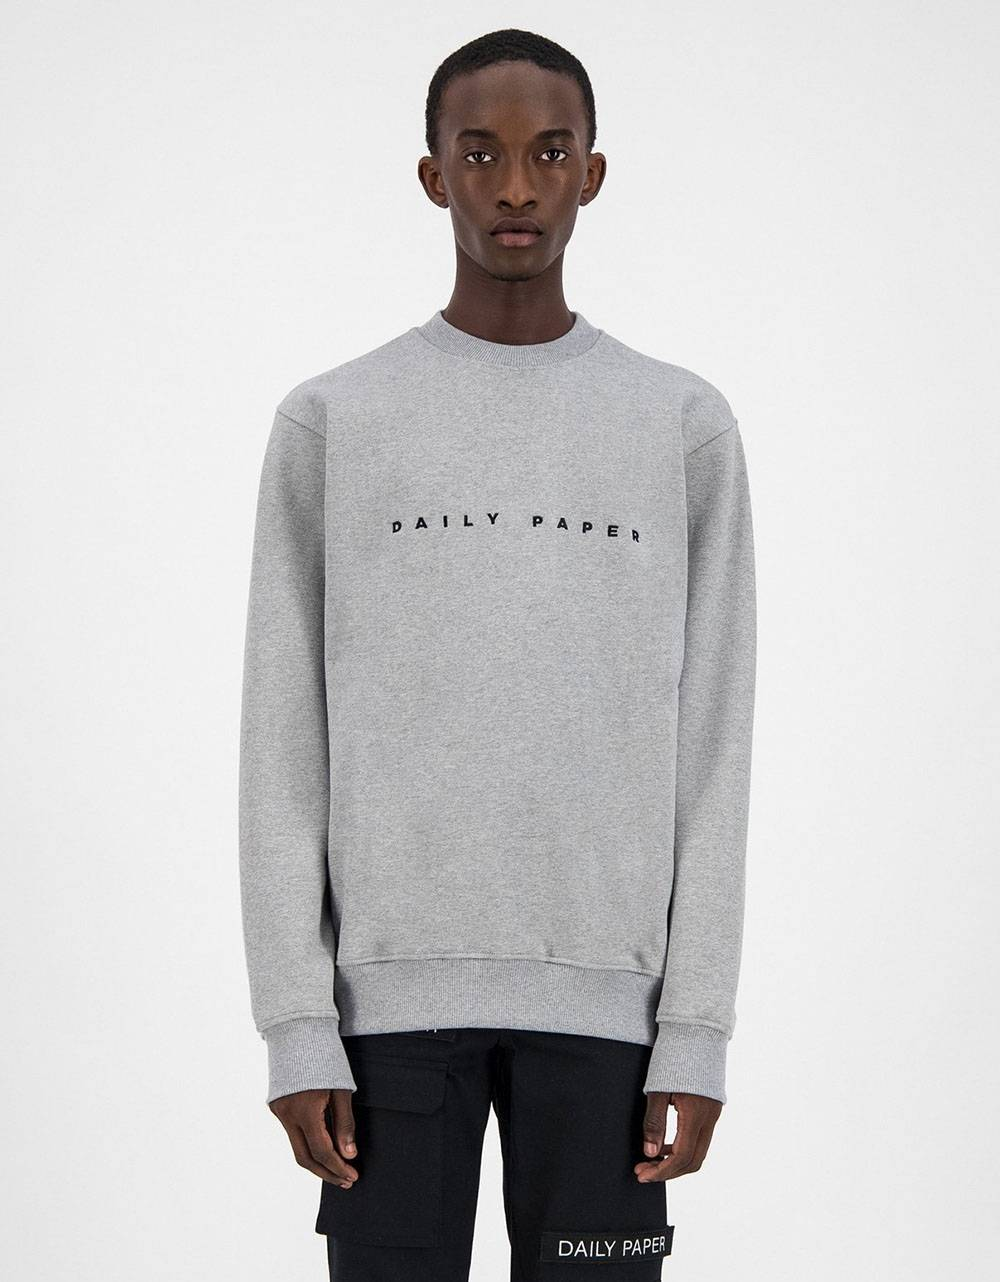 Daily Paper Alias crewneck sweater - Grey/Black DAILY PAPER Sweater 106,00€